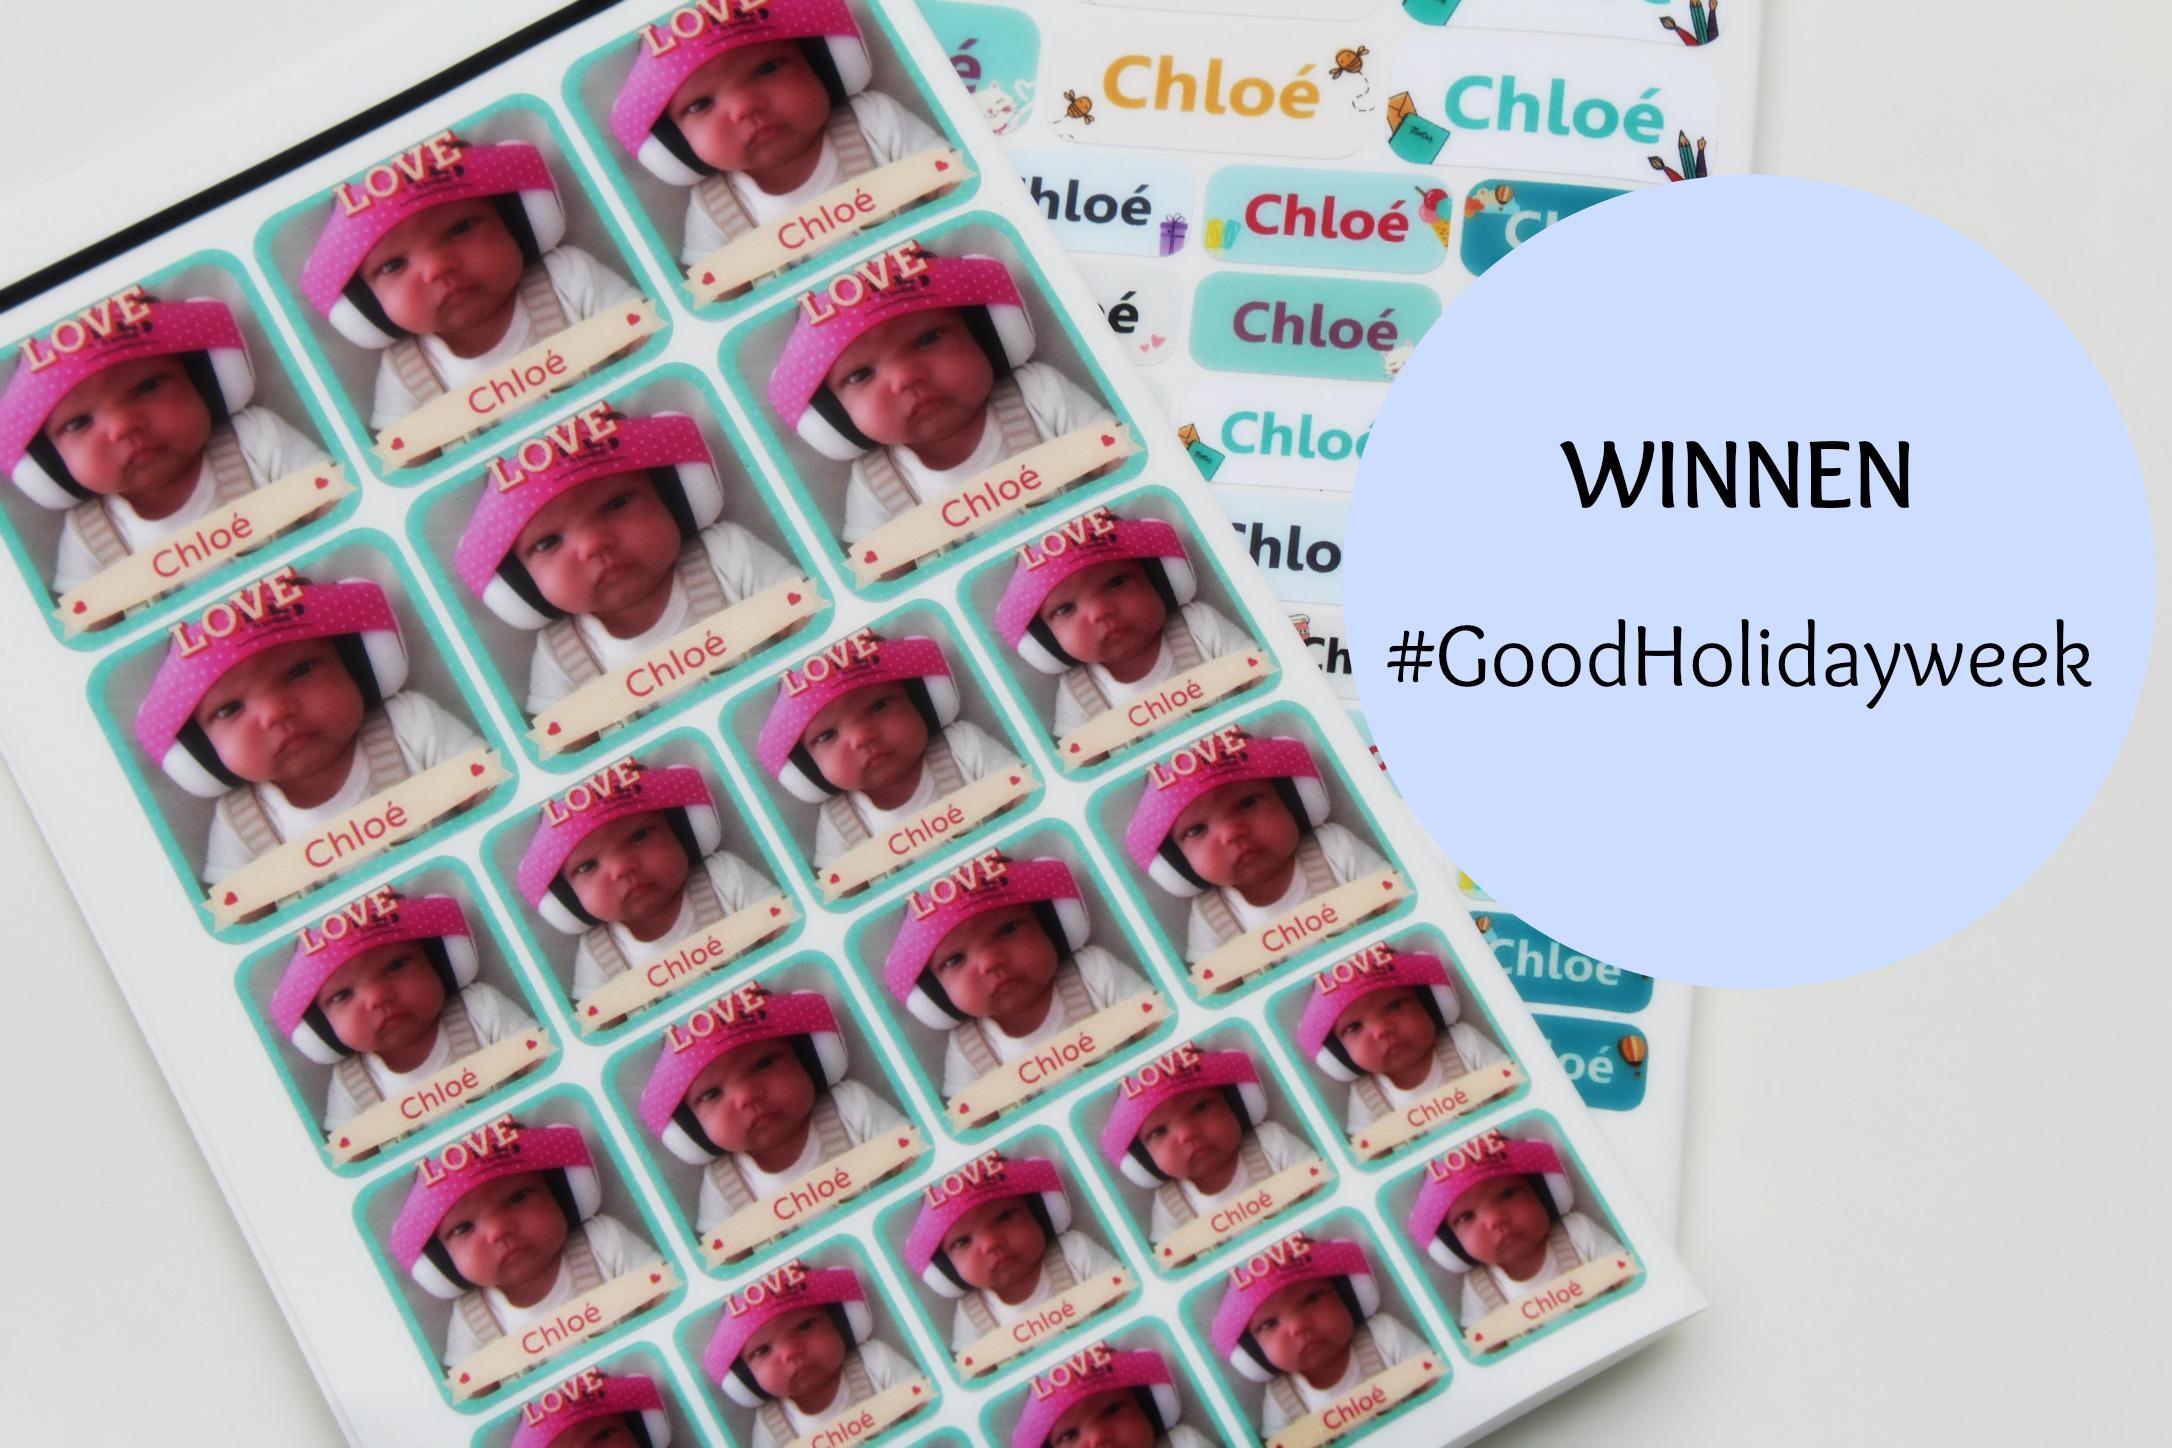 GoodHolidayweek-GoodGirlsCompany-vakantie winweek